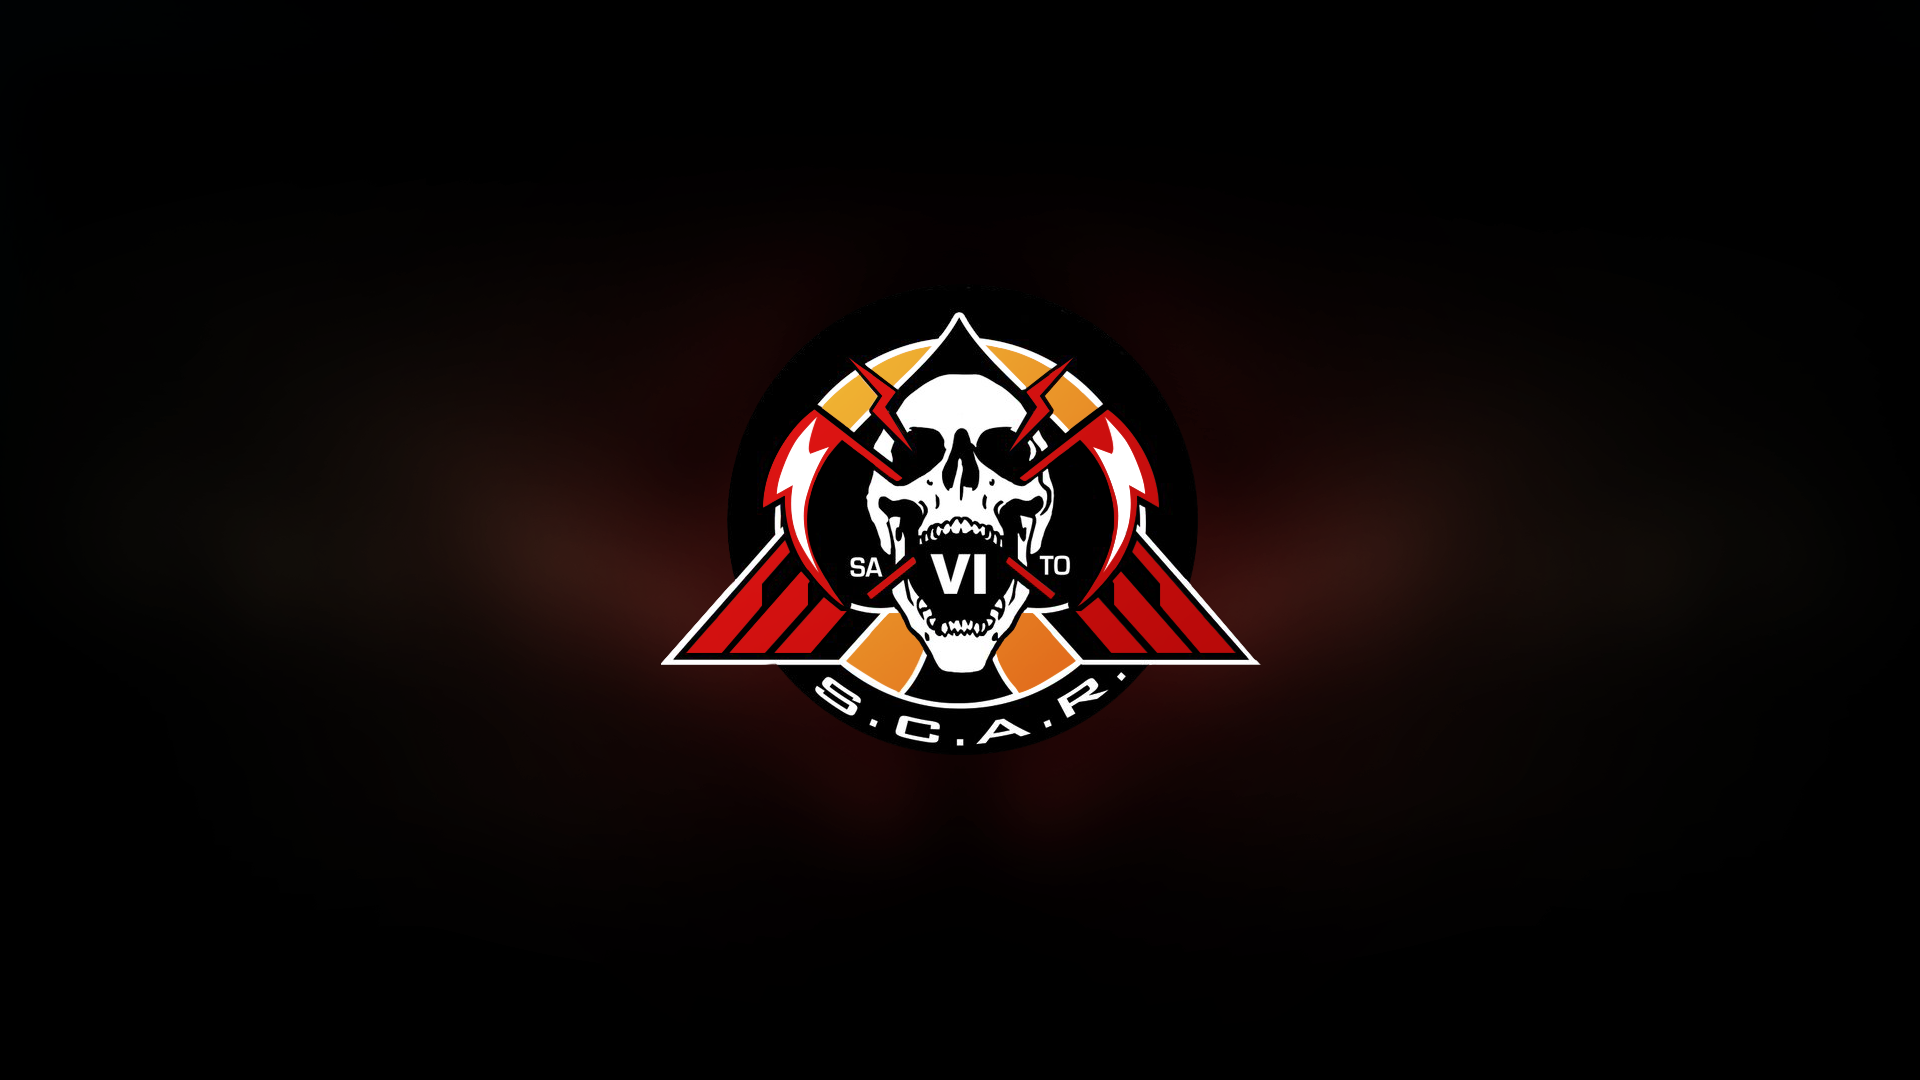 Emblems On Call Of Duty Army Deviantart